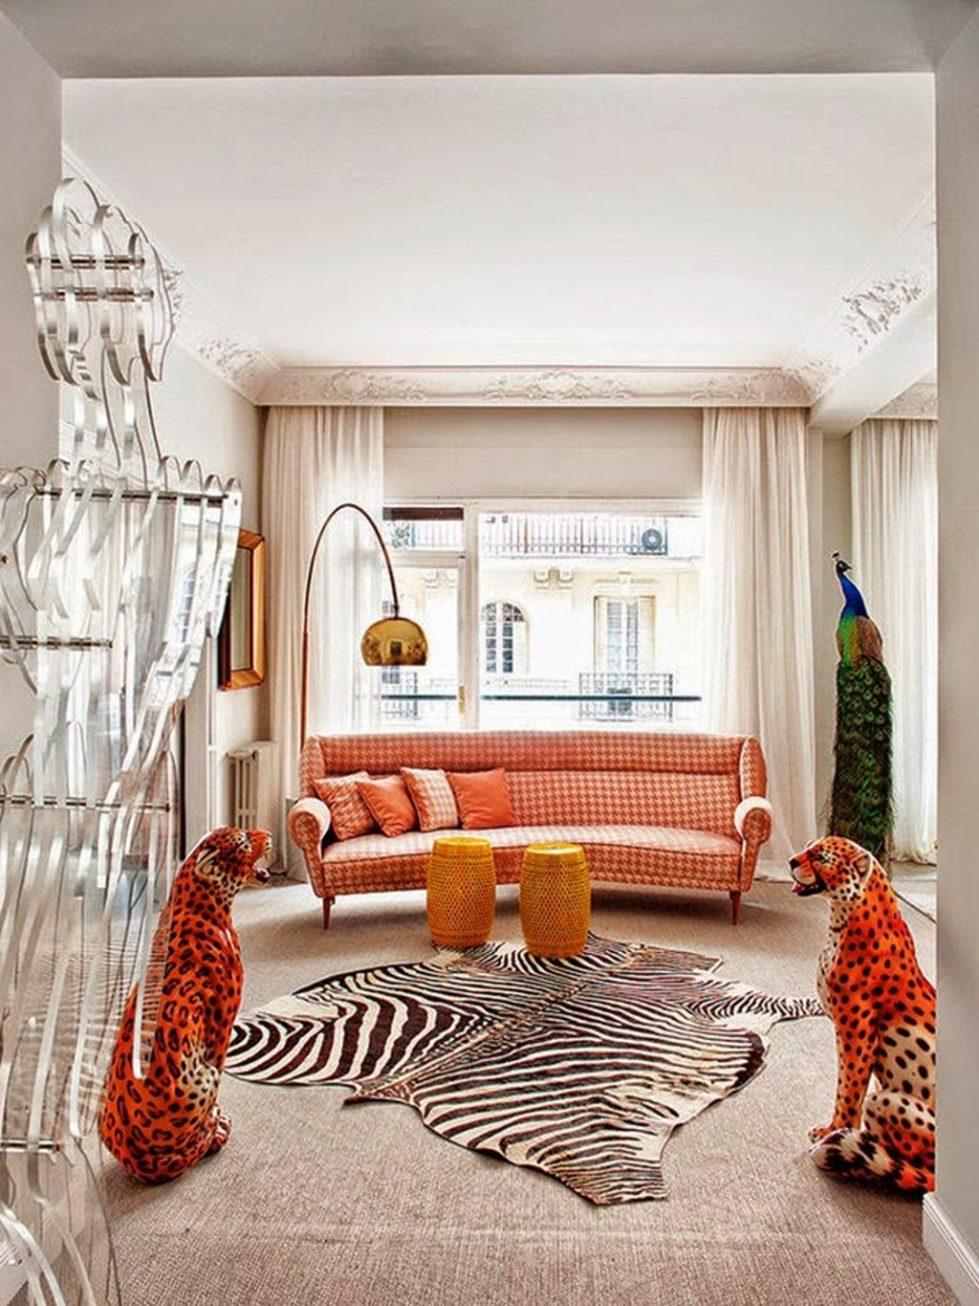 Fusion interior design - living room